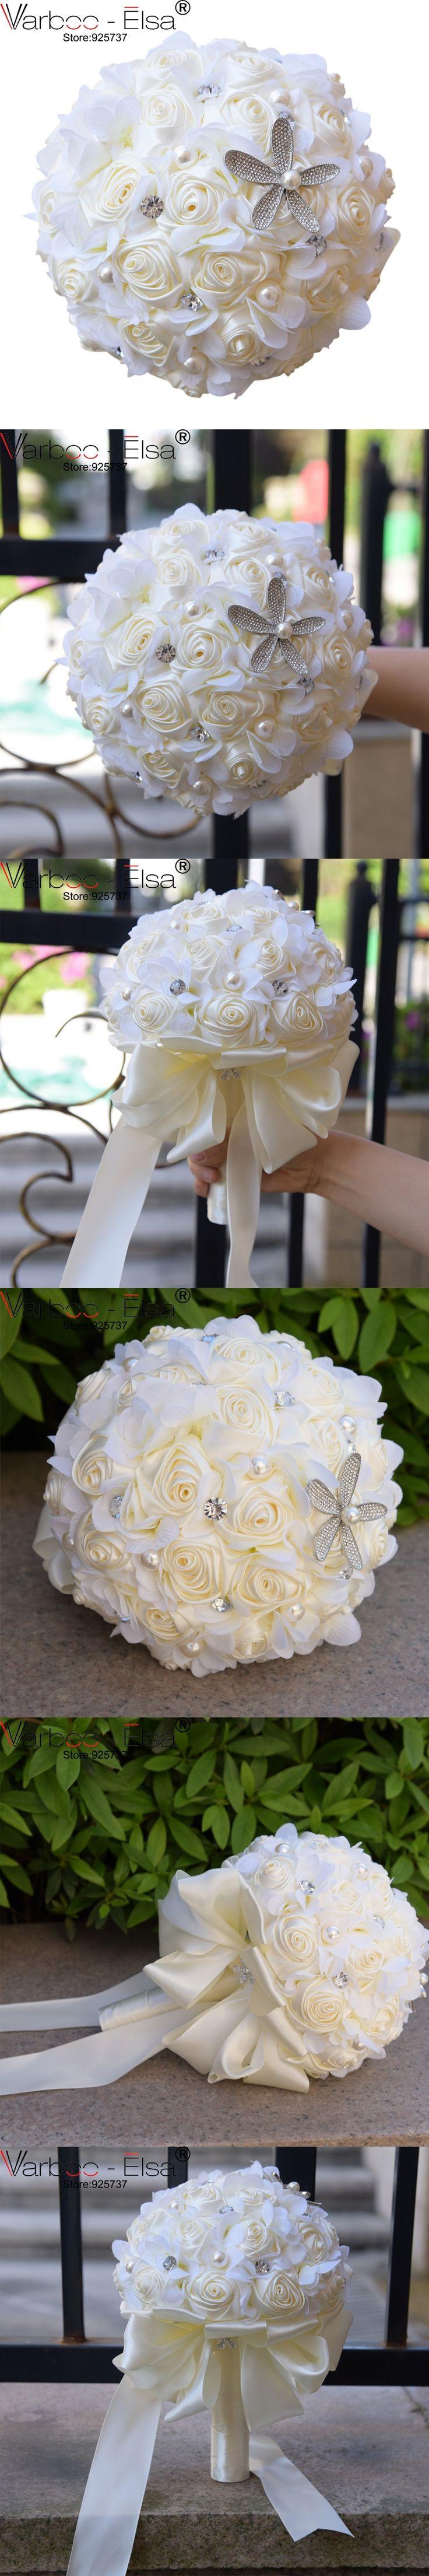 bouquet de fleur mariage new arrvial elegant handmade rhinestone satin crystal wedding bouquets artificial wedding bouquets